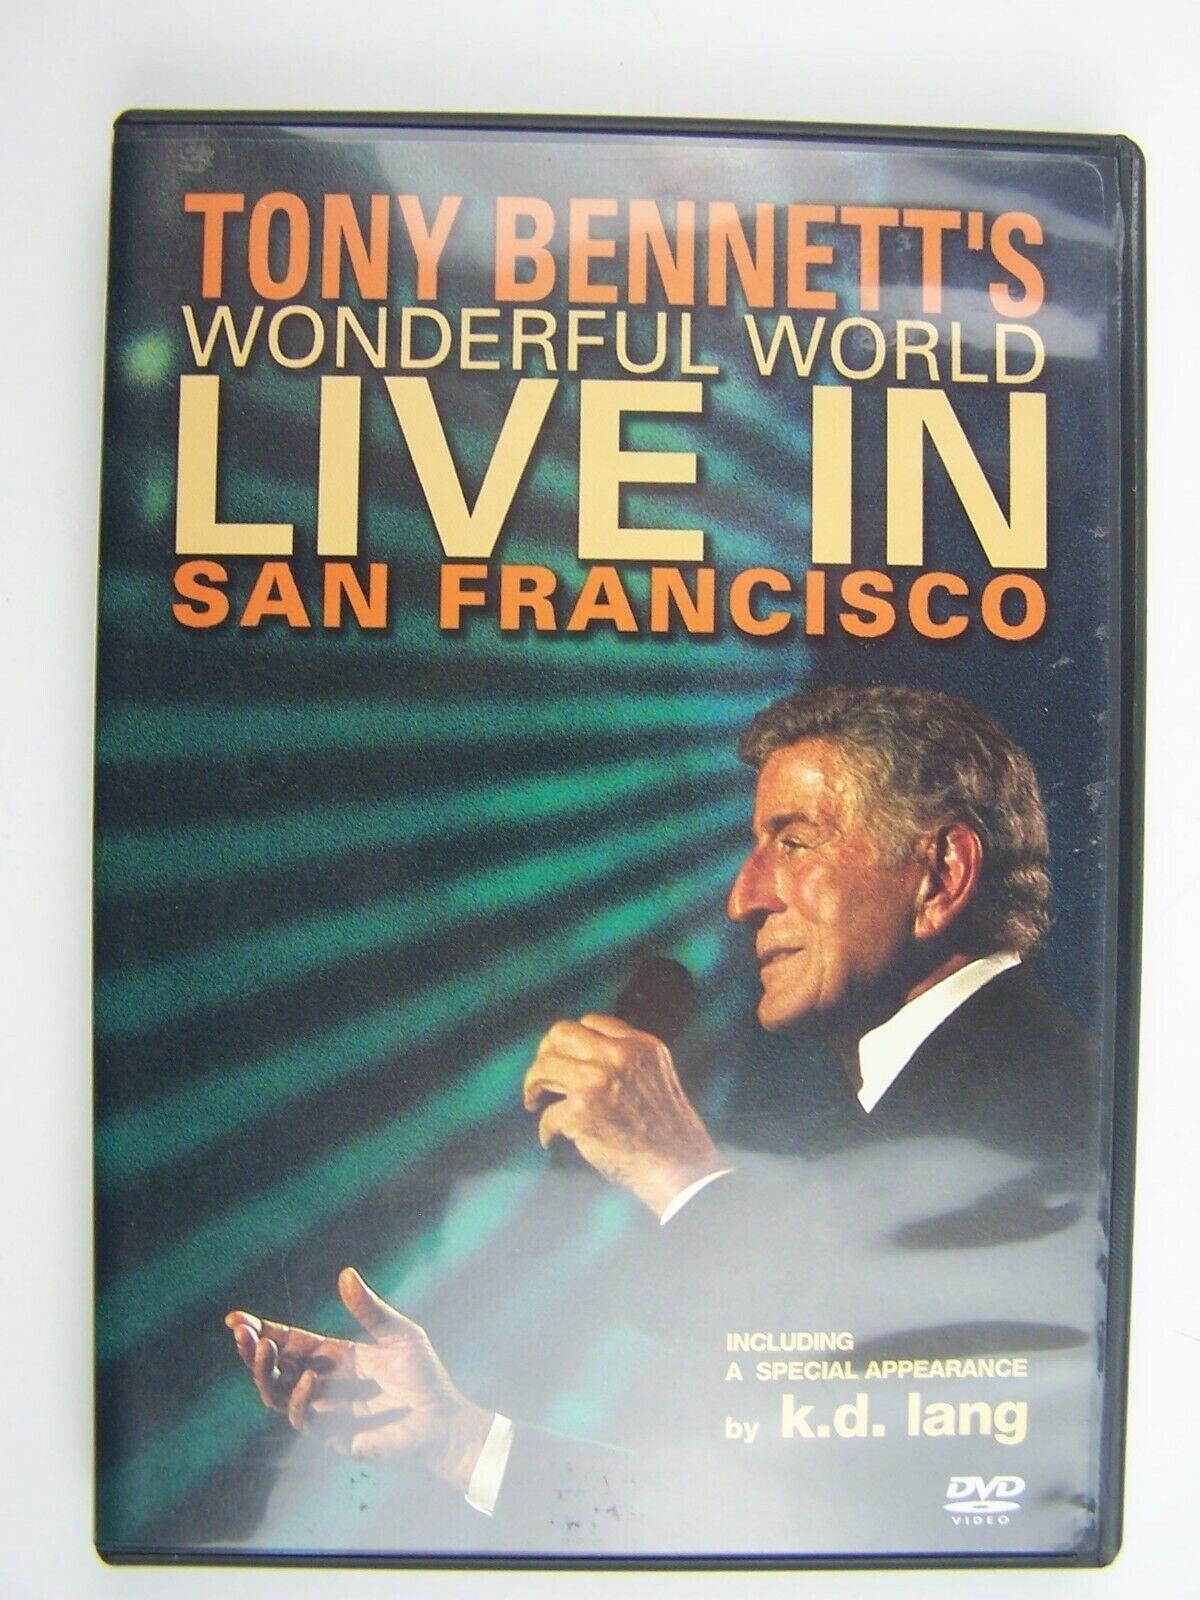 Tony Bennett's Wonderful World: Live In San Francisco D